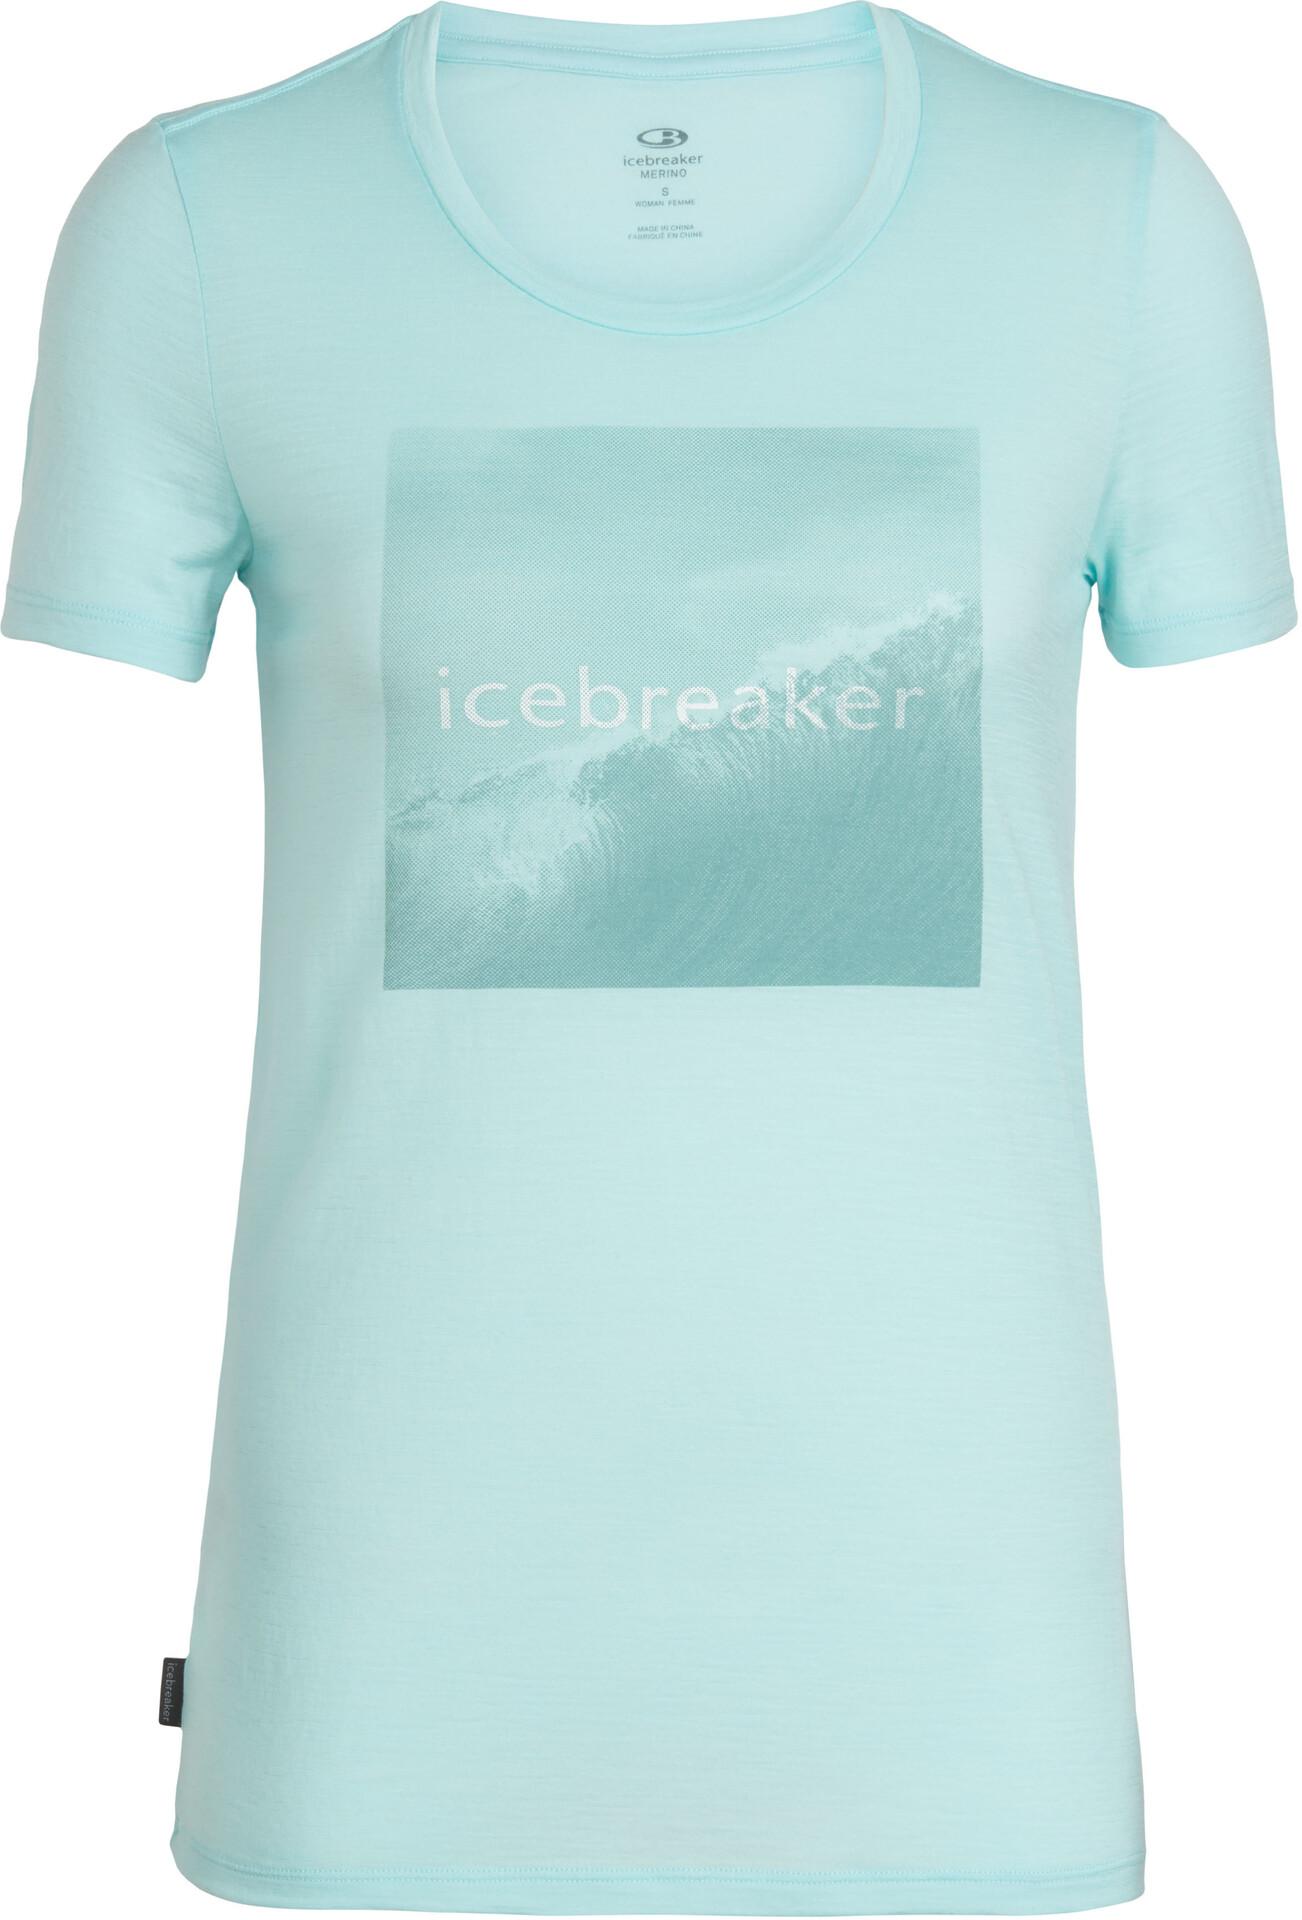 Icebreaker Tech Lite Cadence Pulse SS Low Crewe Top Women, wavelogoaqua splash